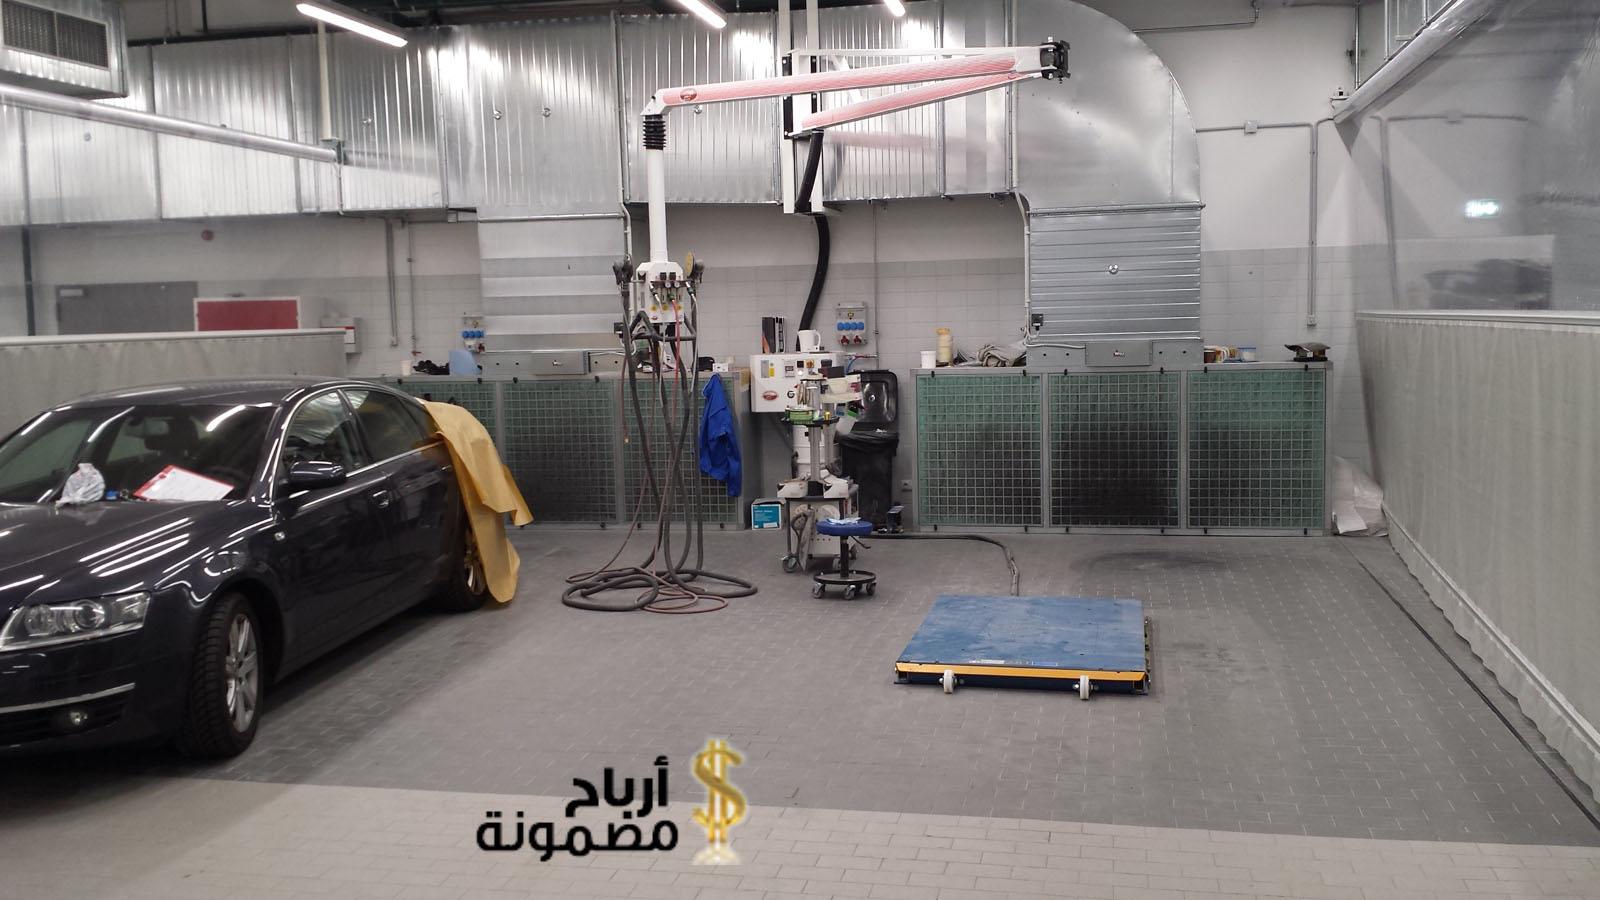 Photo of دراسة جدوى ورشة سيارات وأهم نصائح نجاح المشروع